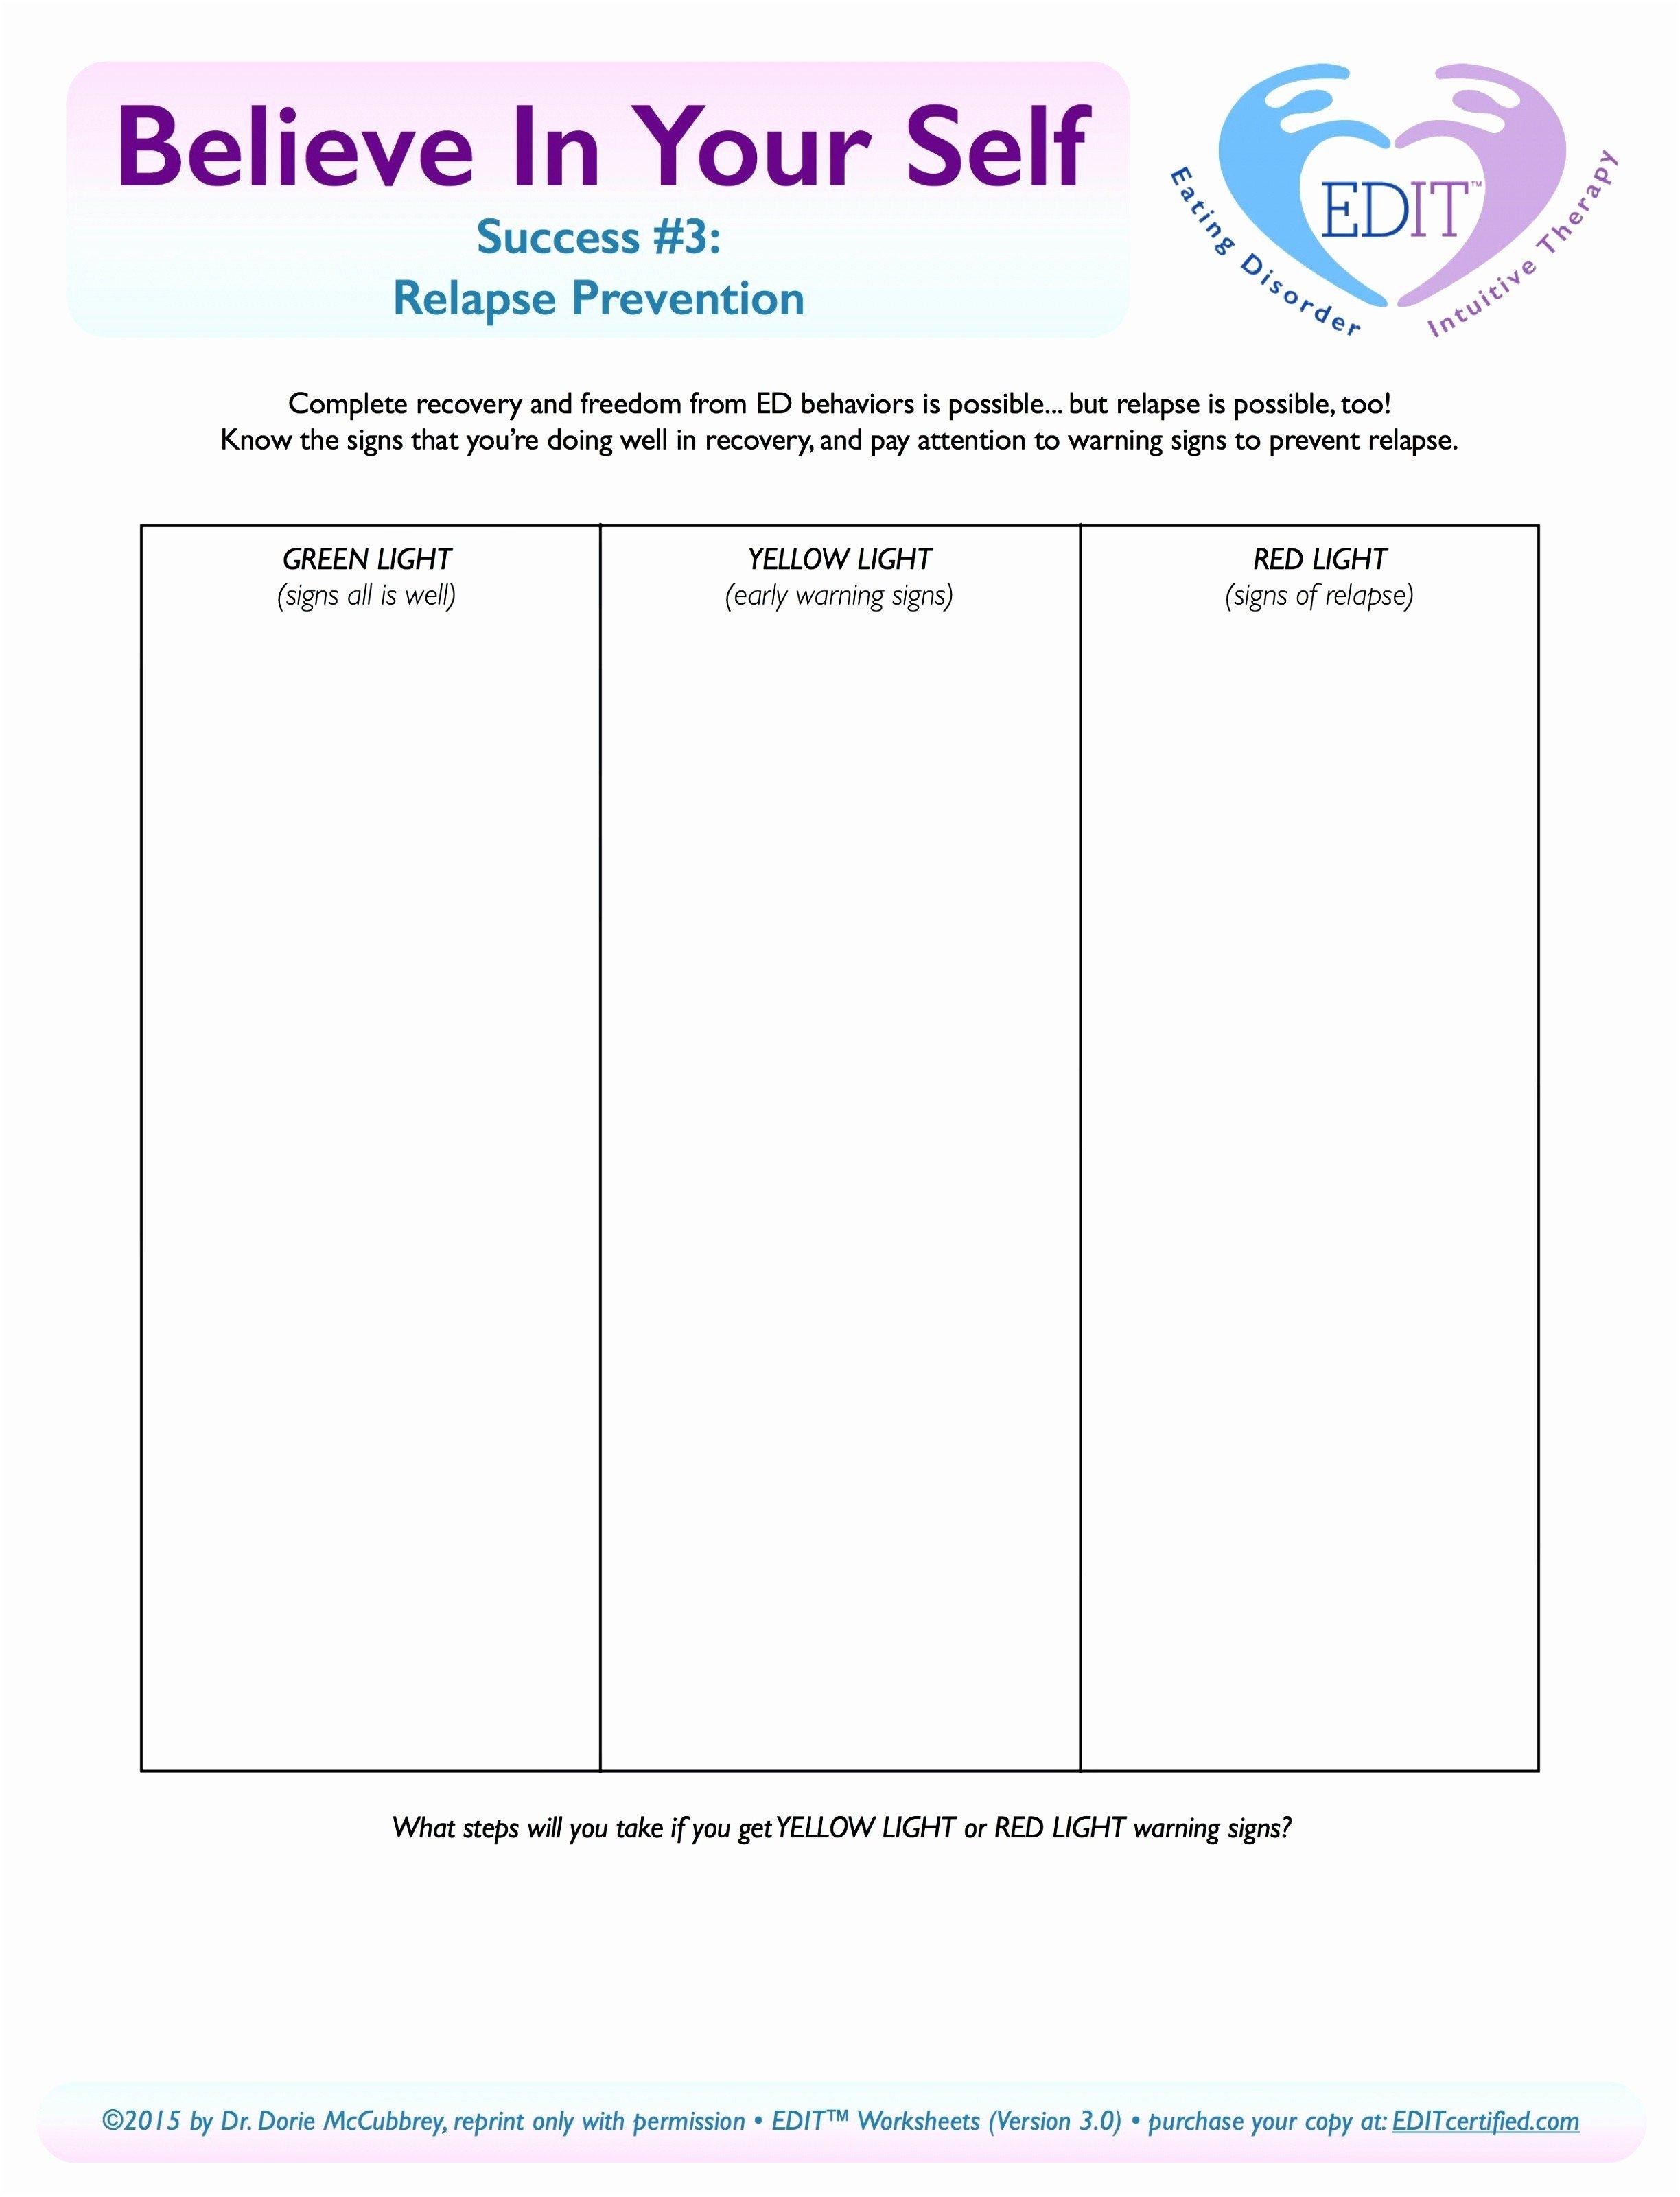 022 Substance Abuse Group Worksheets Elegant Relapse Prevention Plan For Motivational Interviewing Worksheets